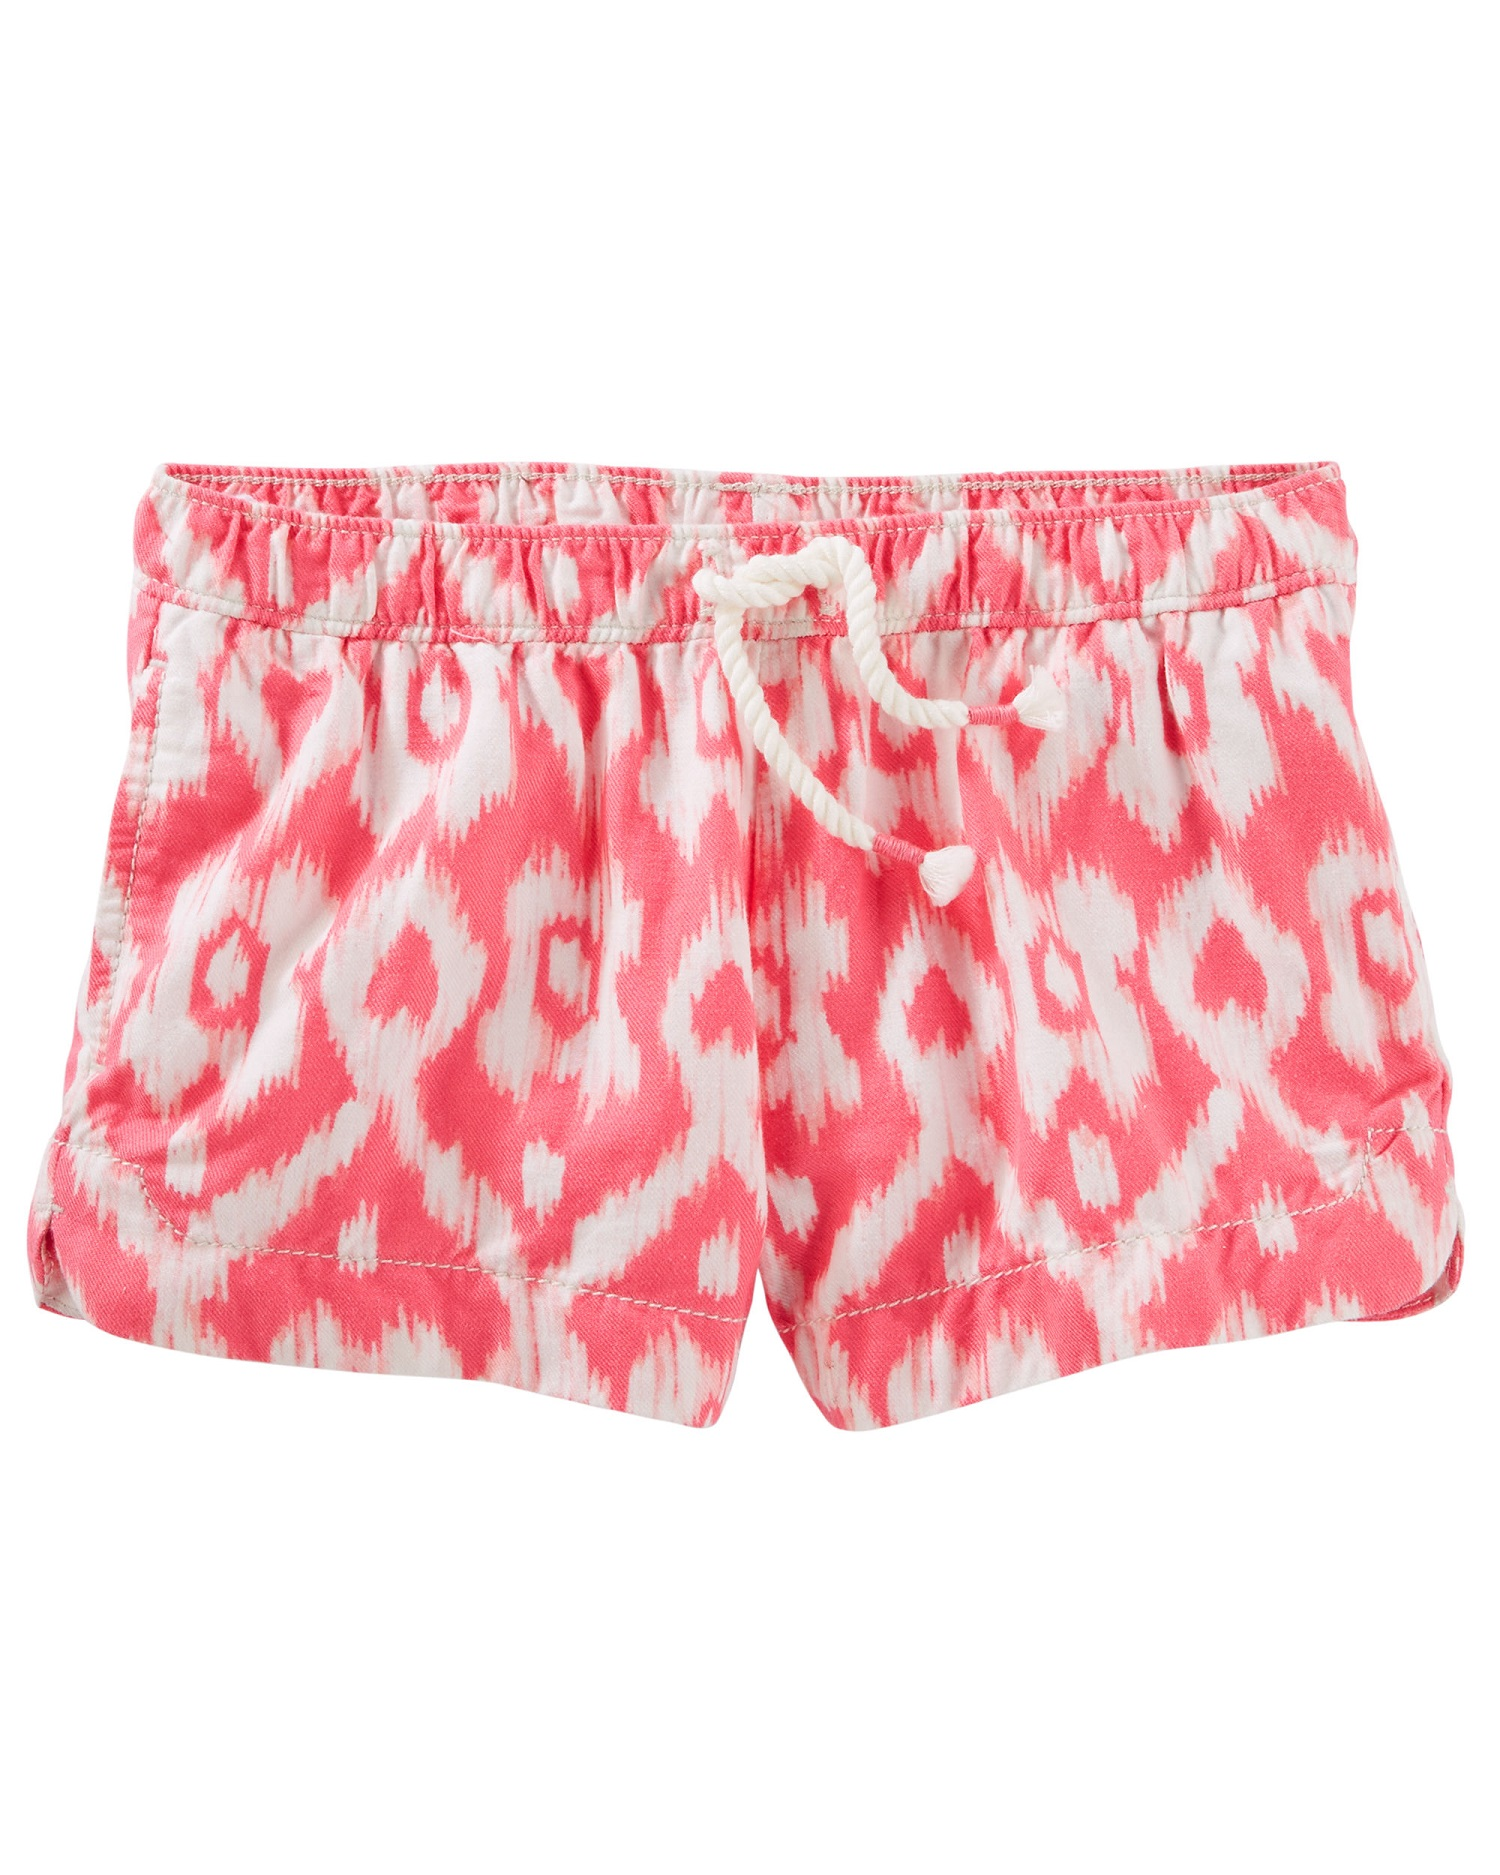 OshKosh B'gosh Baby Girls' Ikat Print Sun Shorts, 12 Months